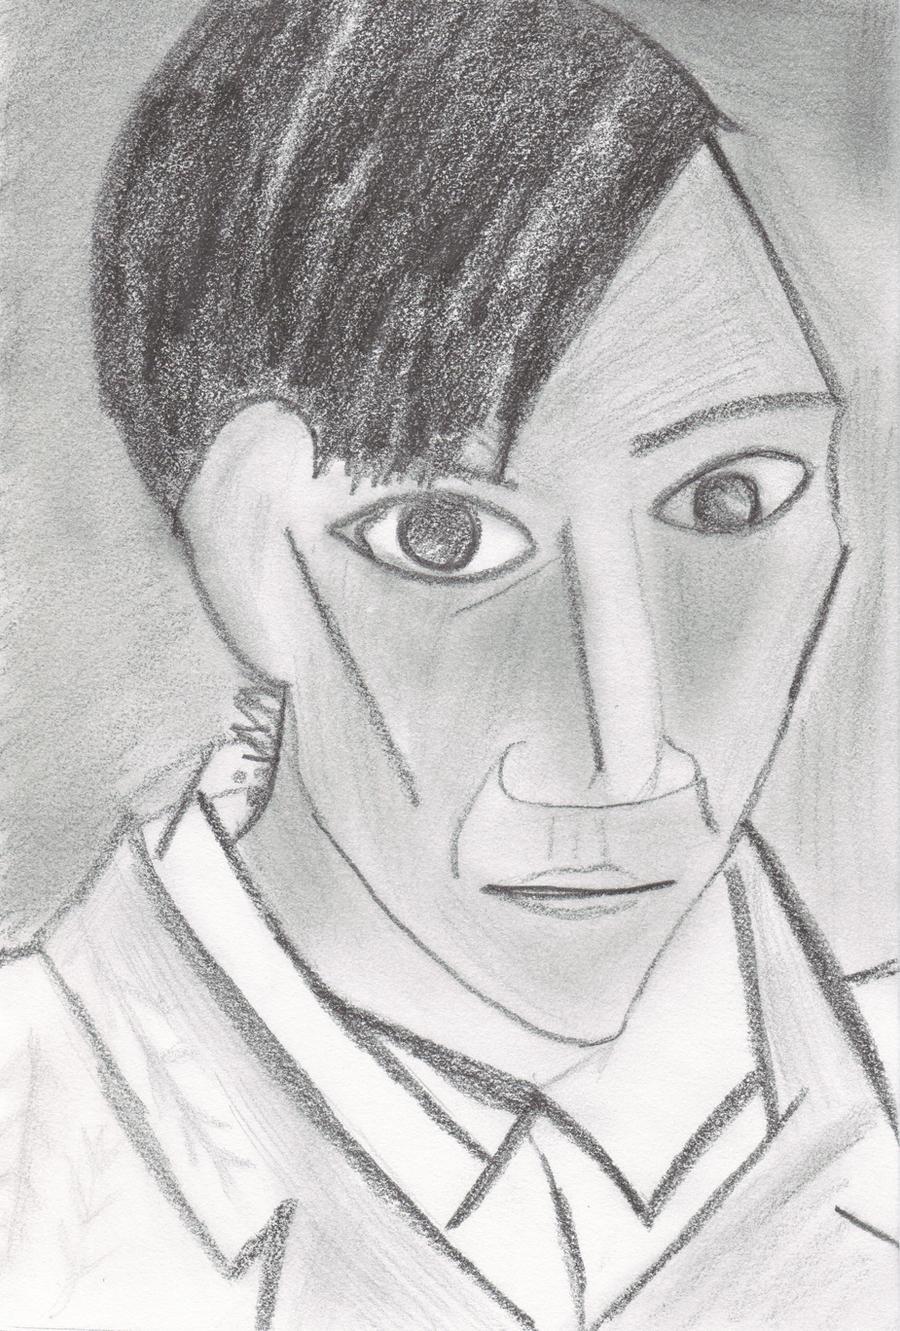 Pablo Picaso's Self Portrait by Reijou on DeviantArt